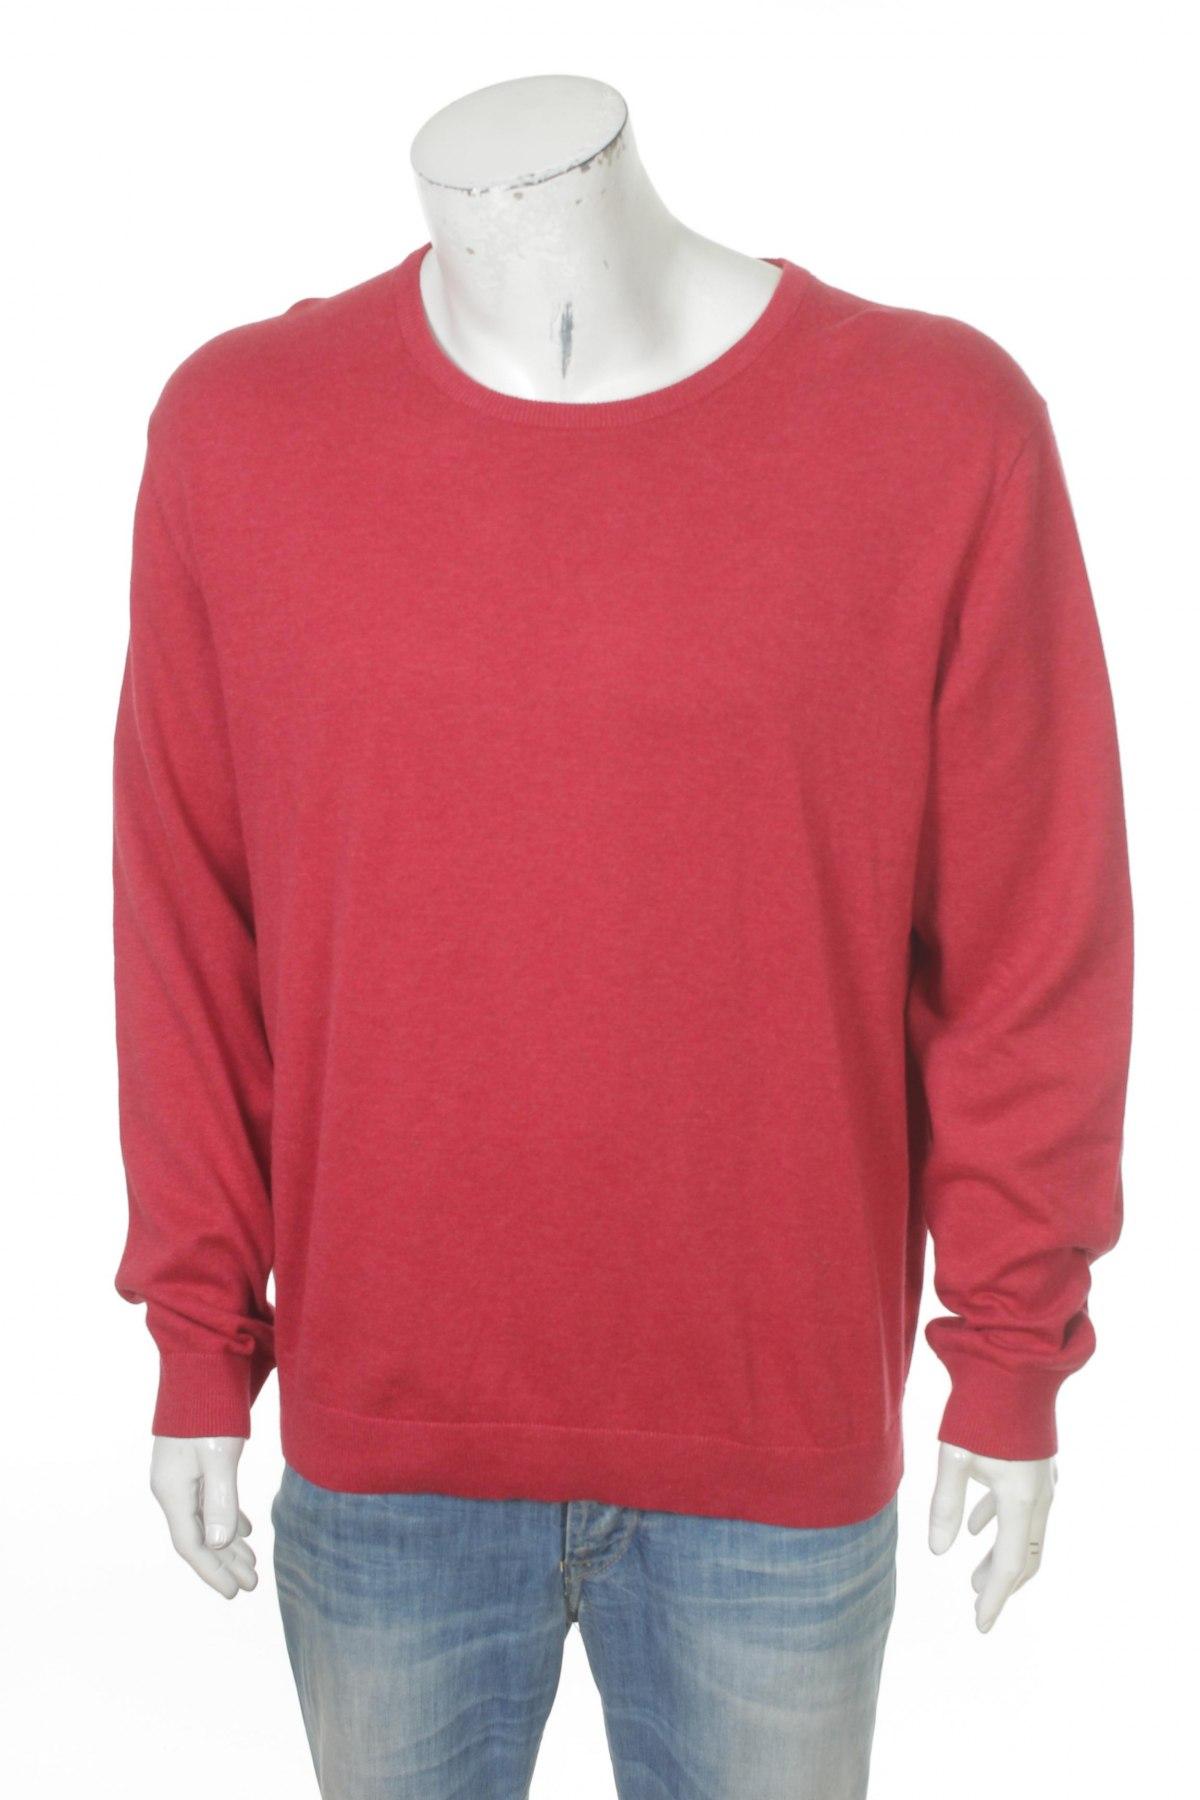 Pánský svetr Montego - za vyhodnou cenu na Remix -  9158135 c3739951ad